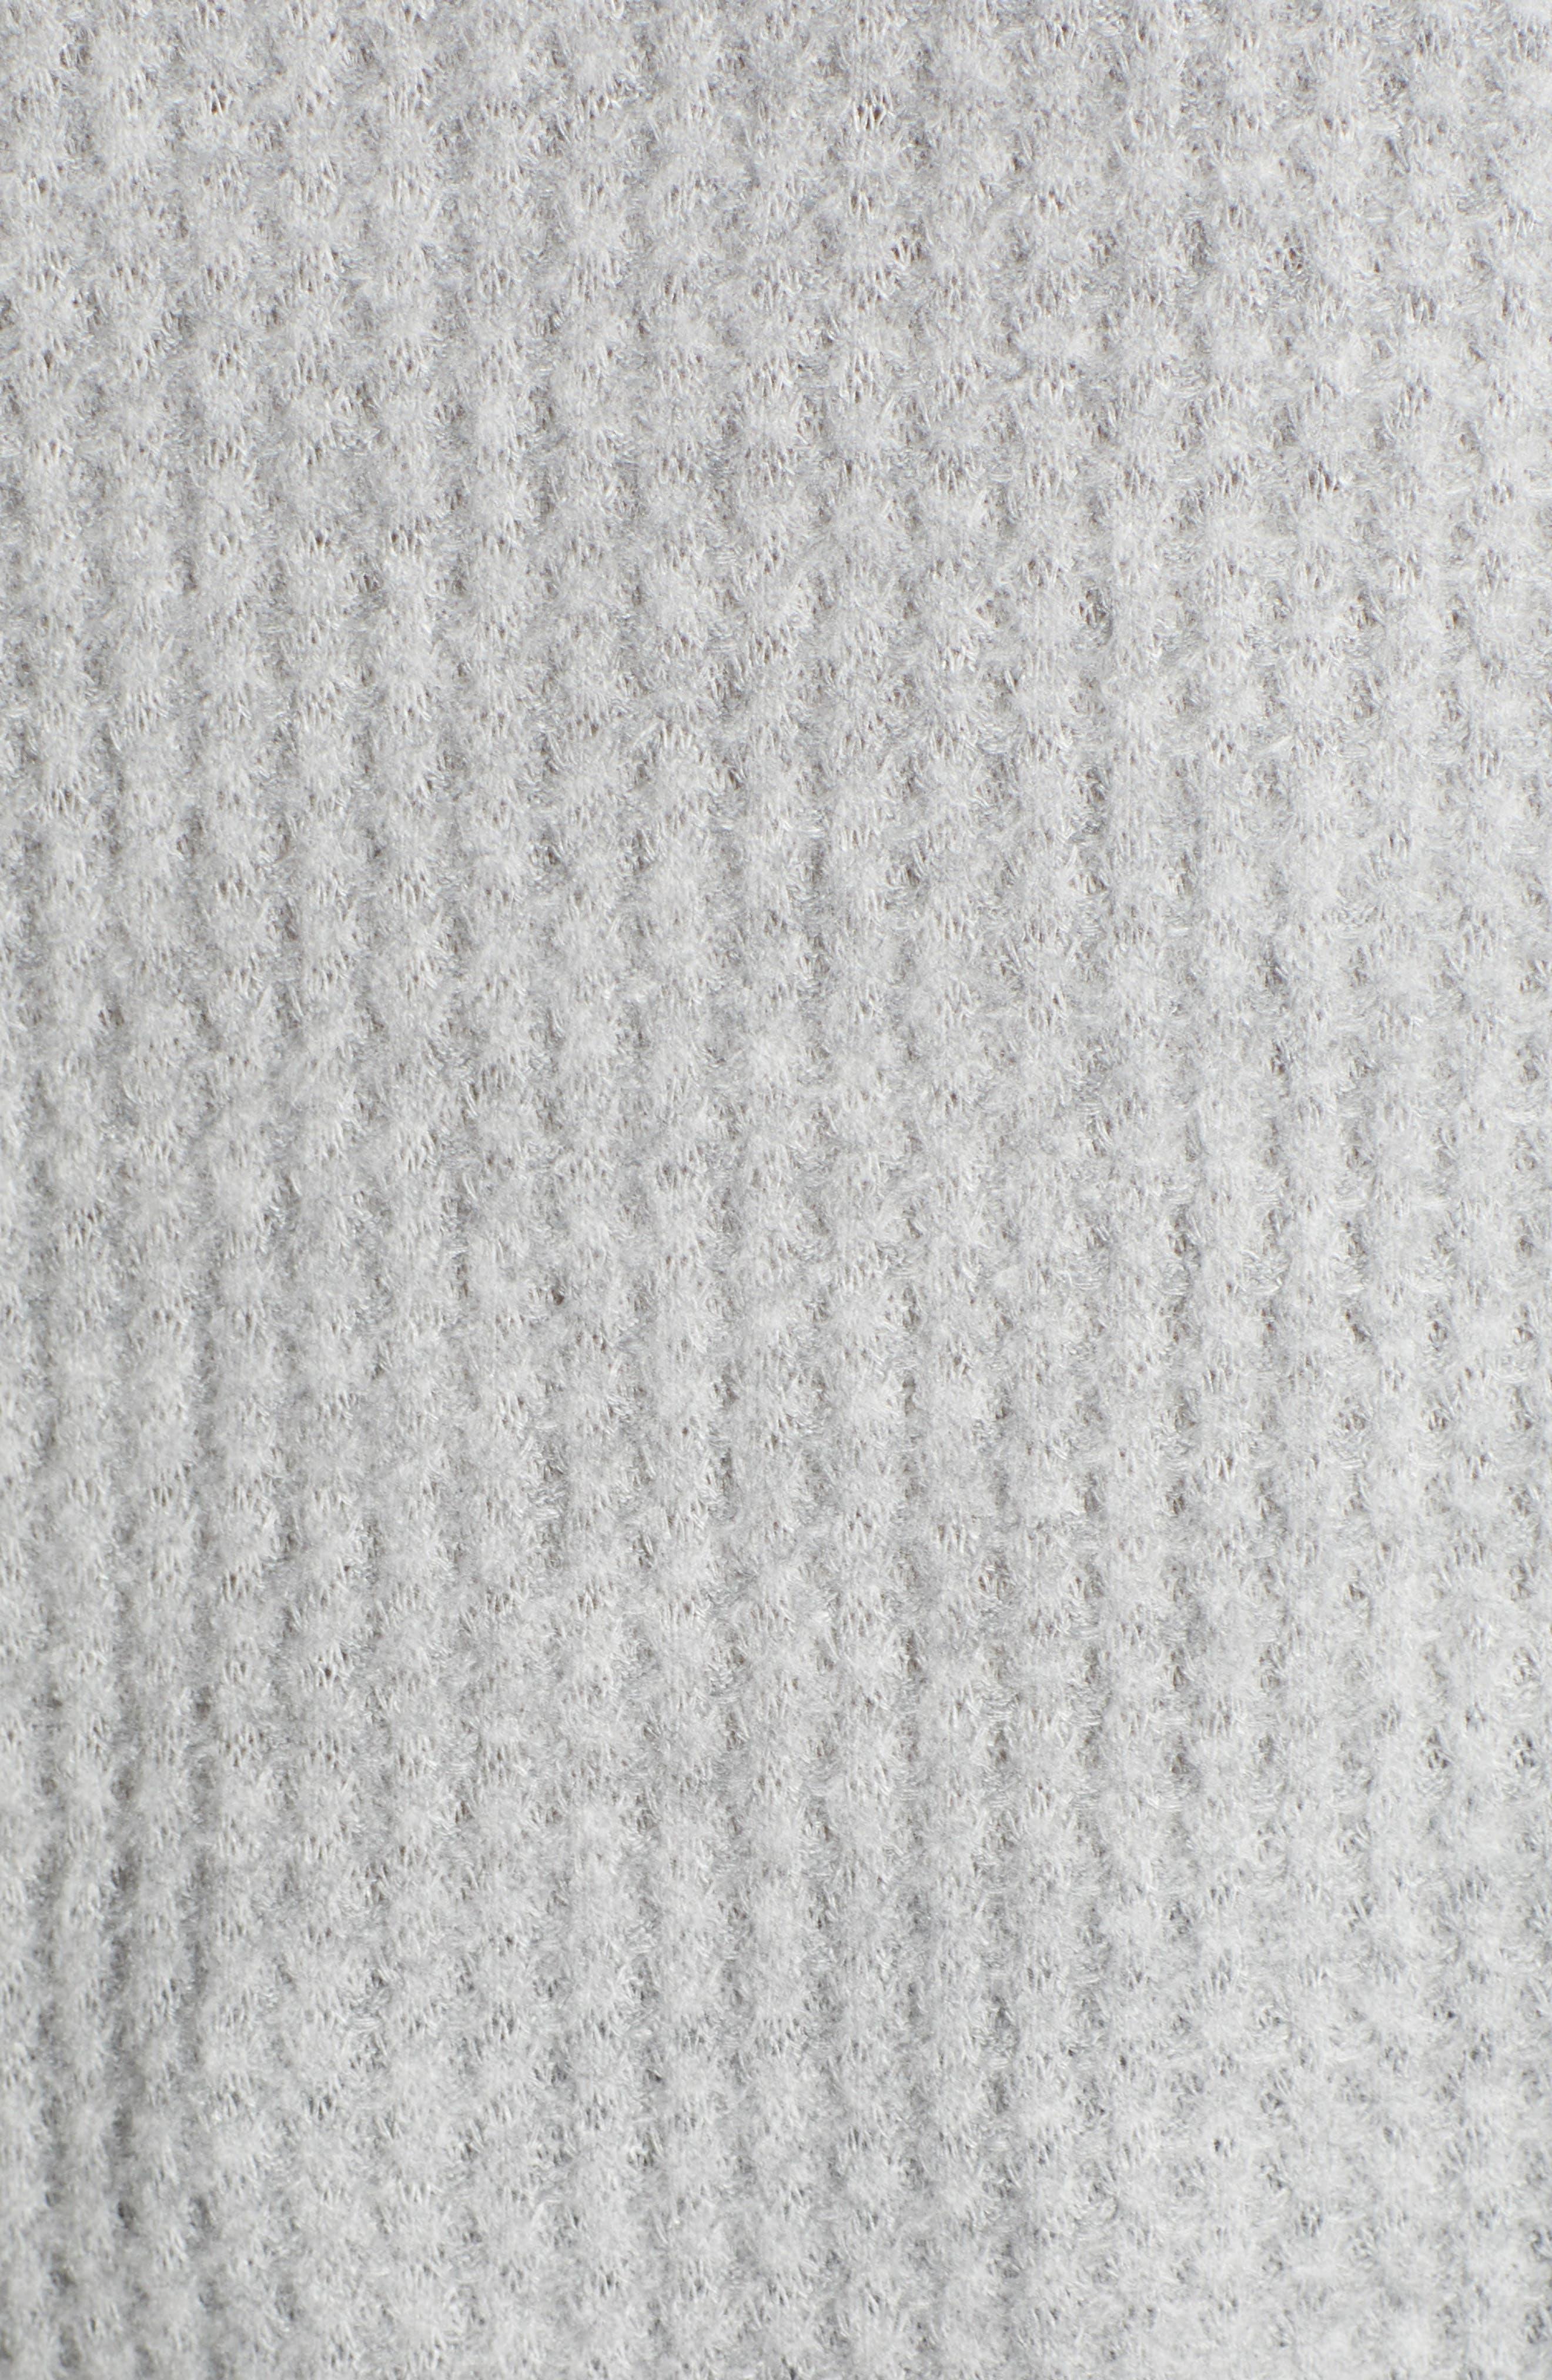 Cozy V-Neck Waffle Knit Tee,                             Alternate thumbnail 5, color,                             030